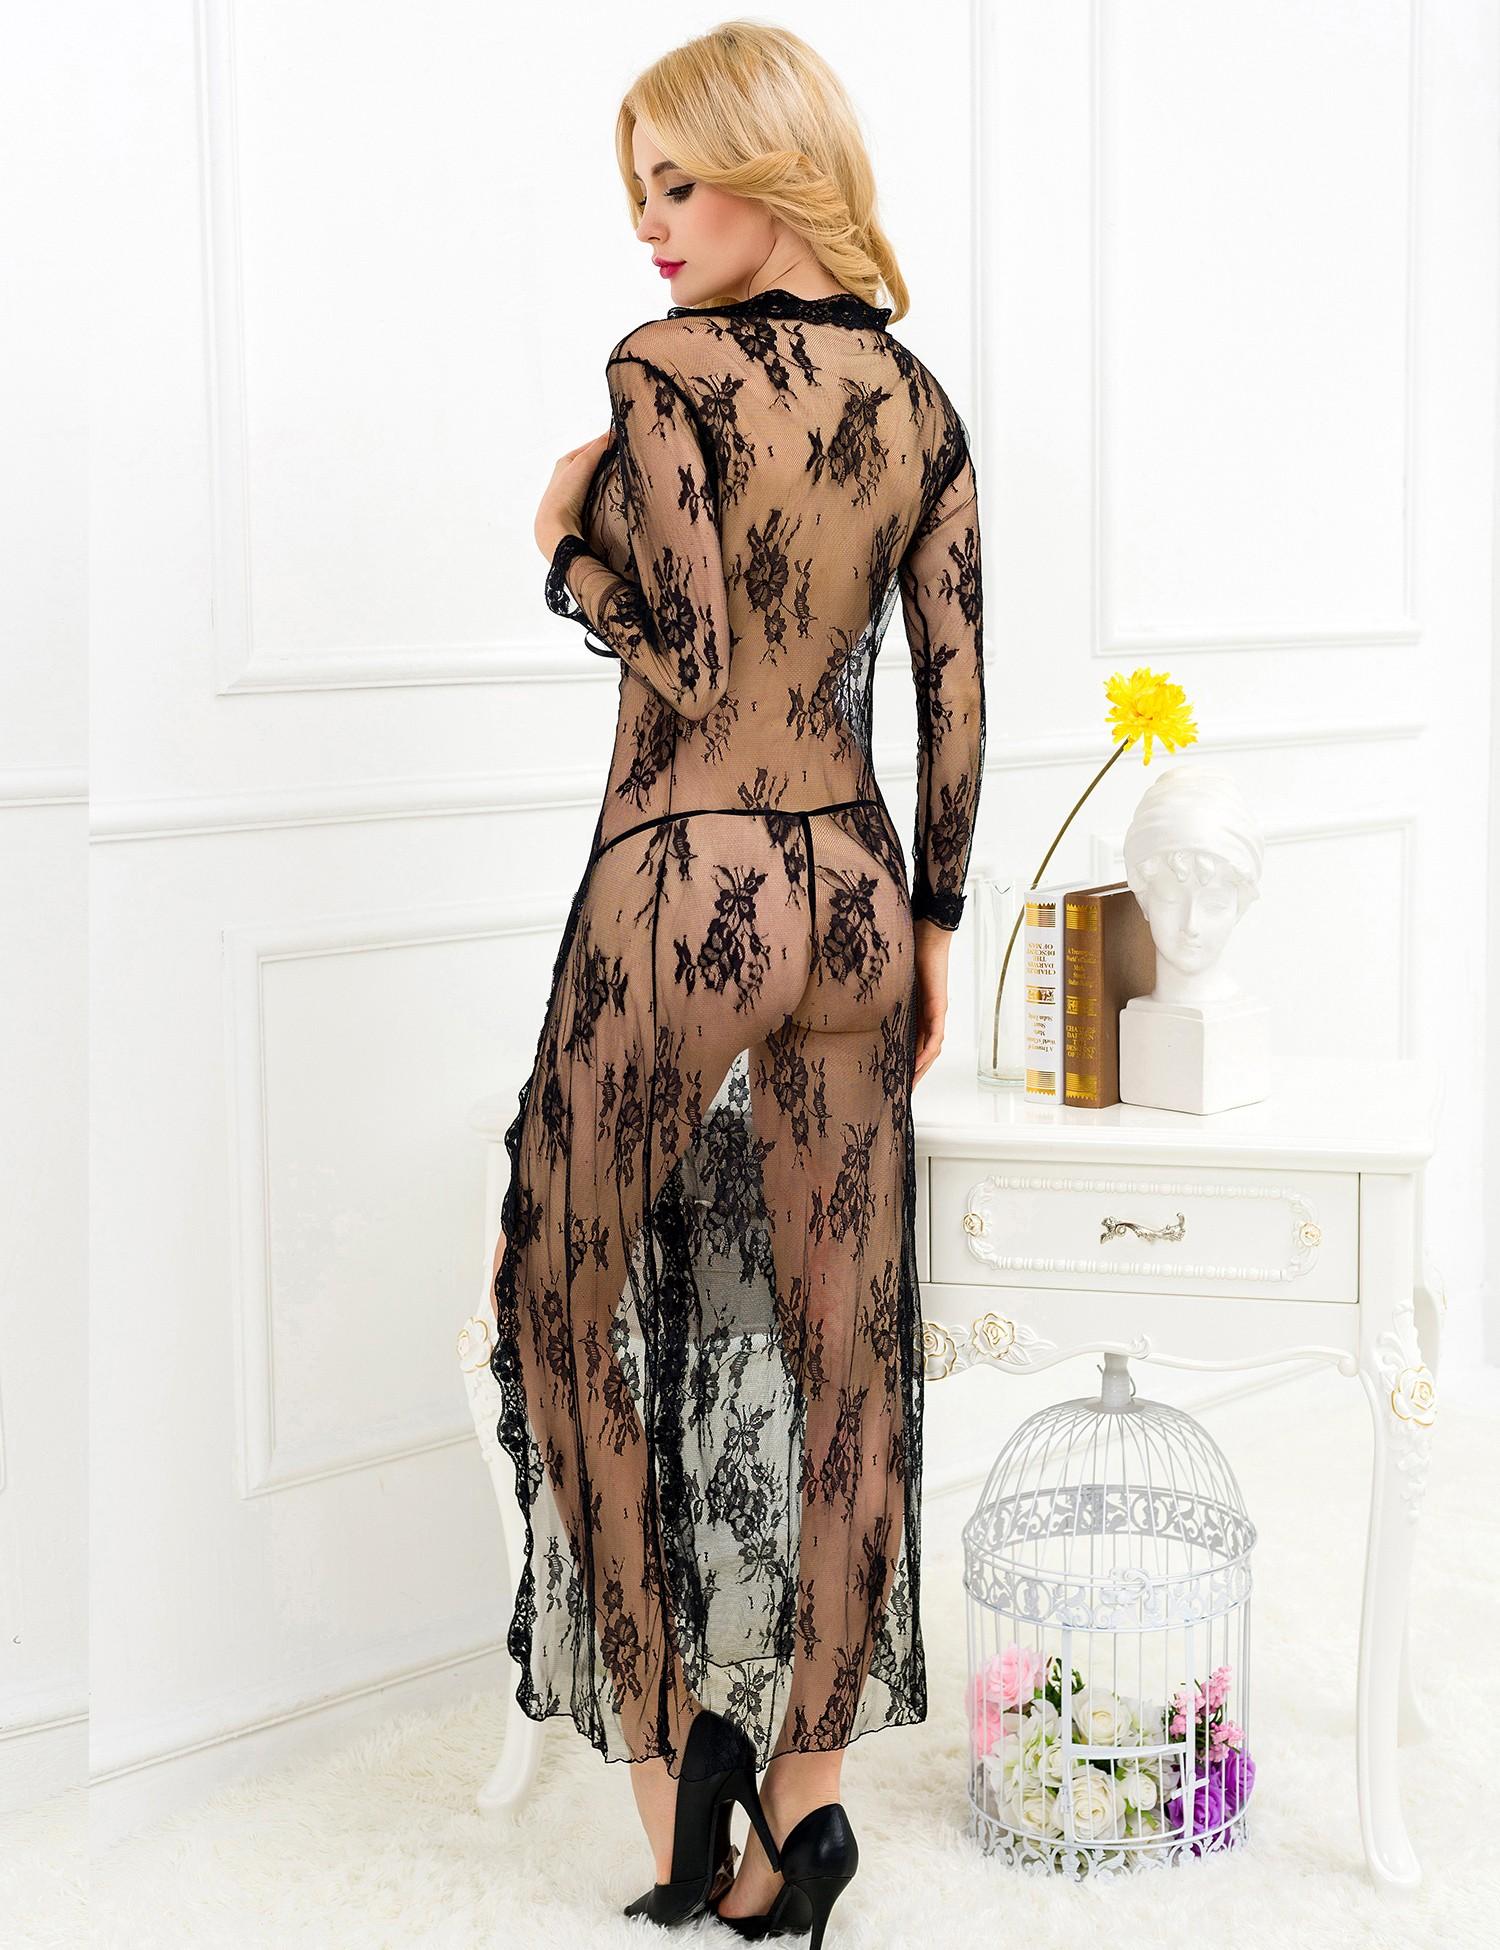 Delicate Lace women clothes, lingerie, sleep wear, clothes, women, panty, panties, underwear, sexy underwear,